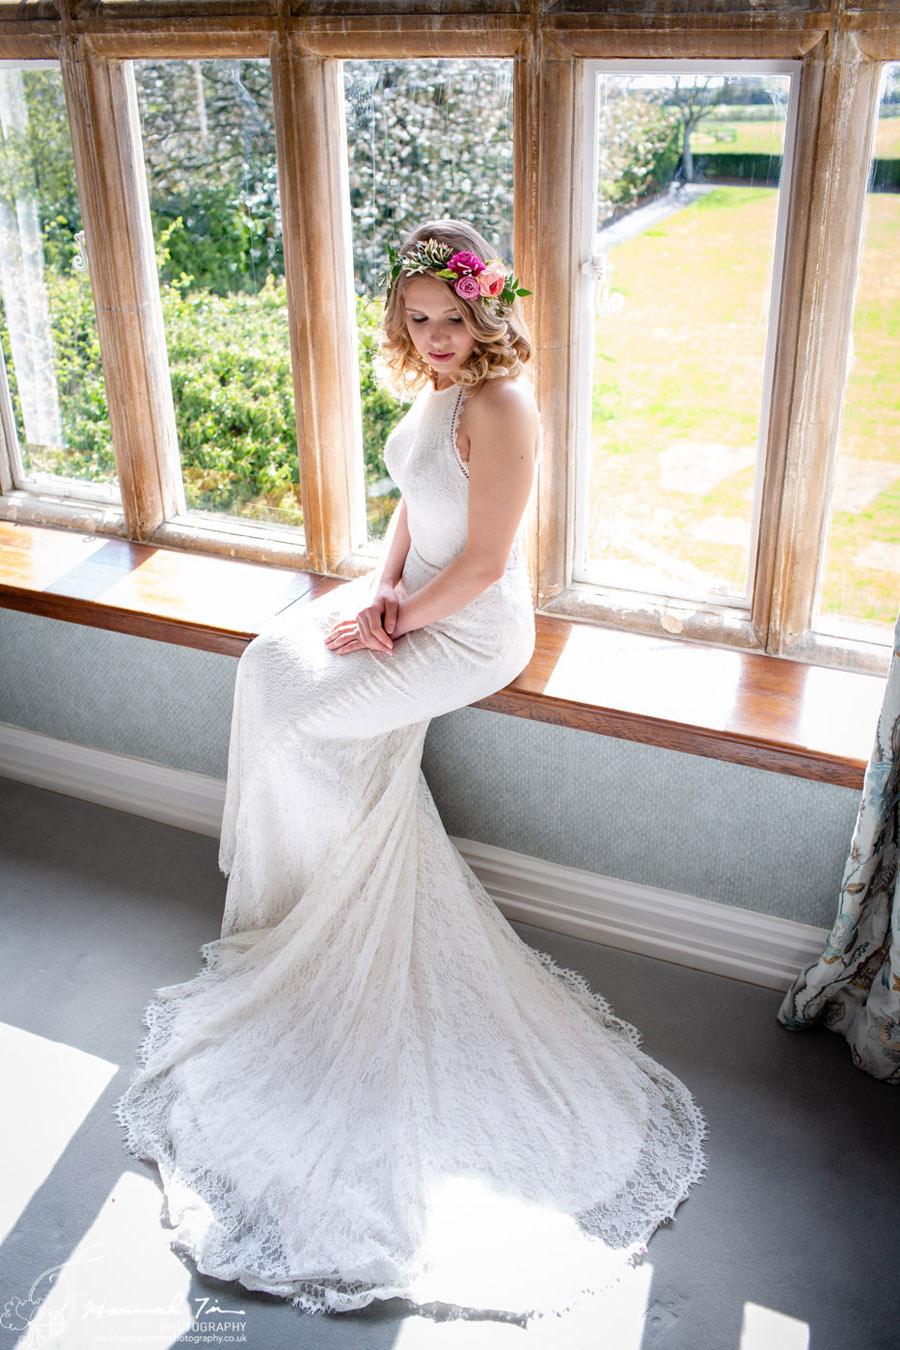 Fabulous spring colour for an Old Church Farm wedding! Photography credit Hannah Timm (5)